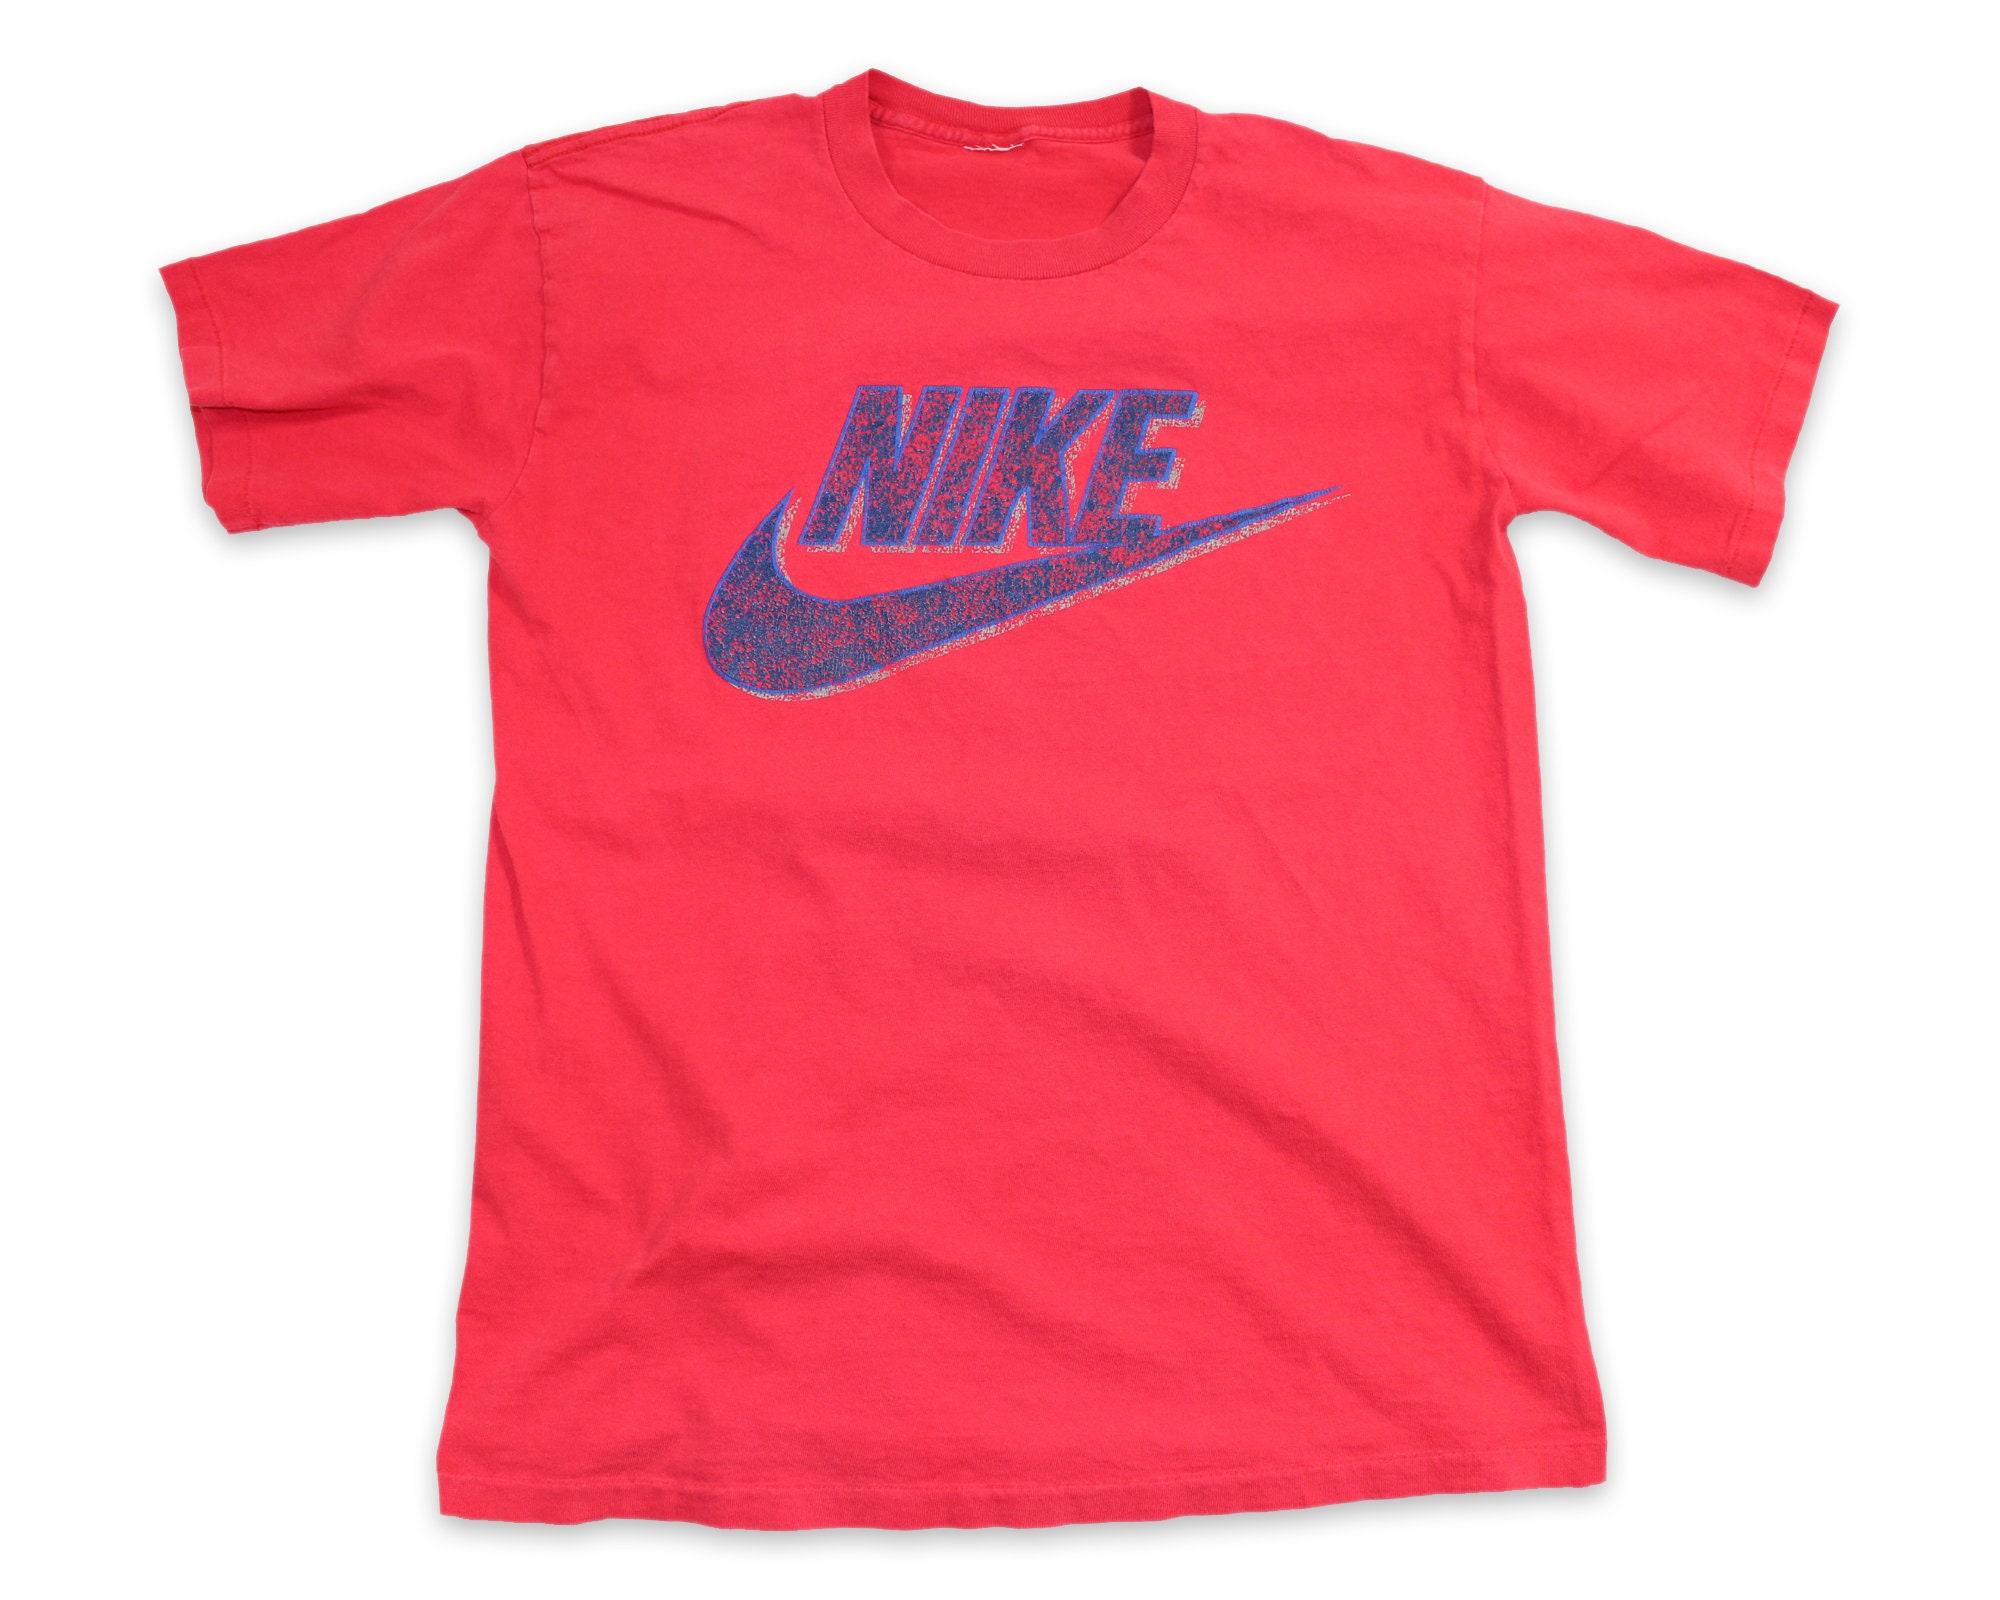 3213b67acba218 90s NIKE SWOOSH Vintage T-Shirt S-M    Iconic Graphic